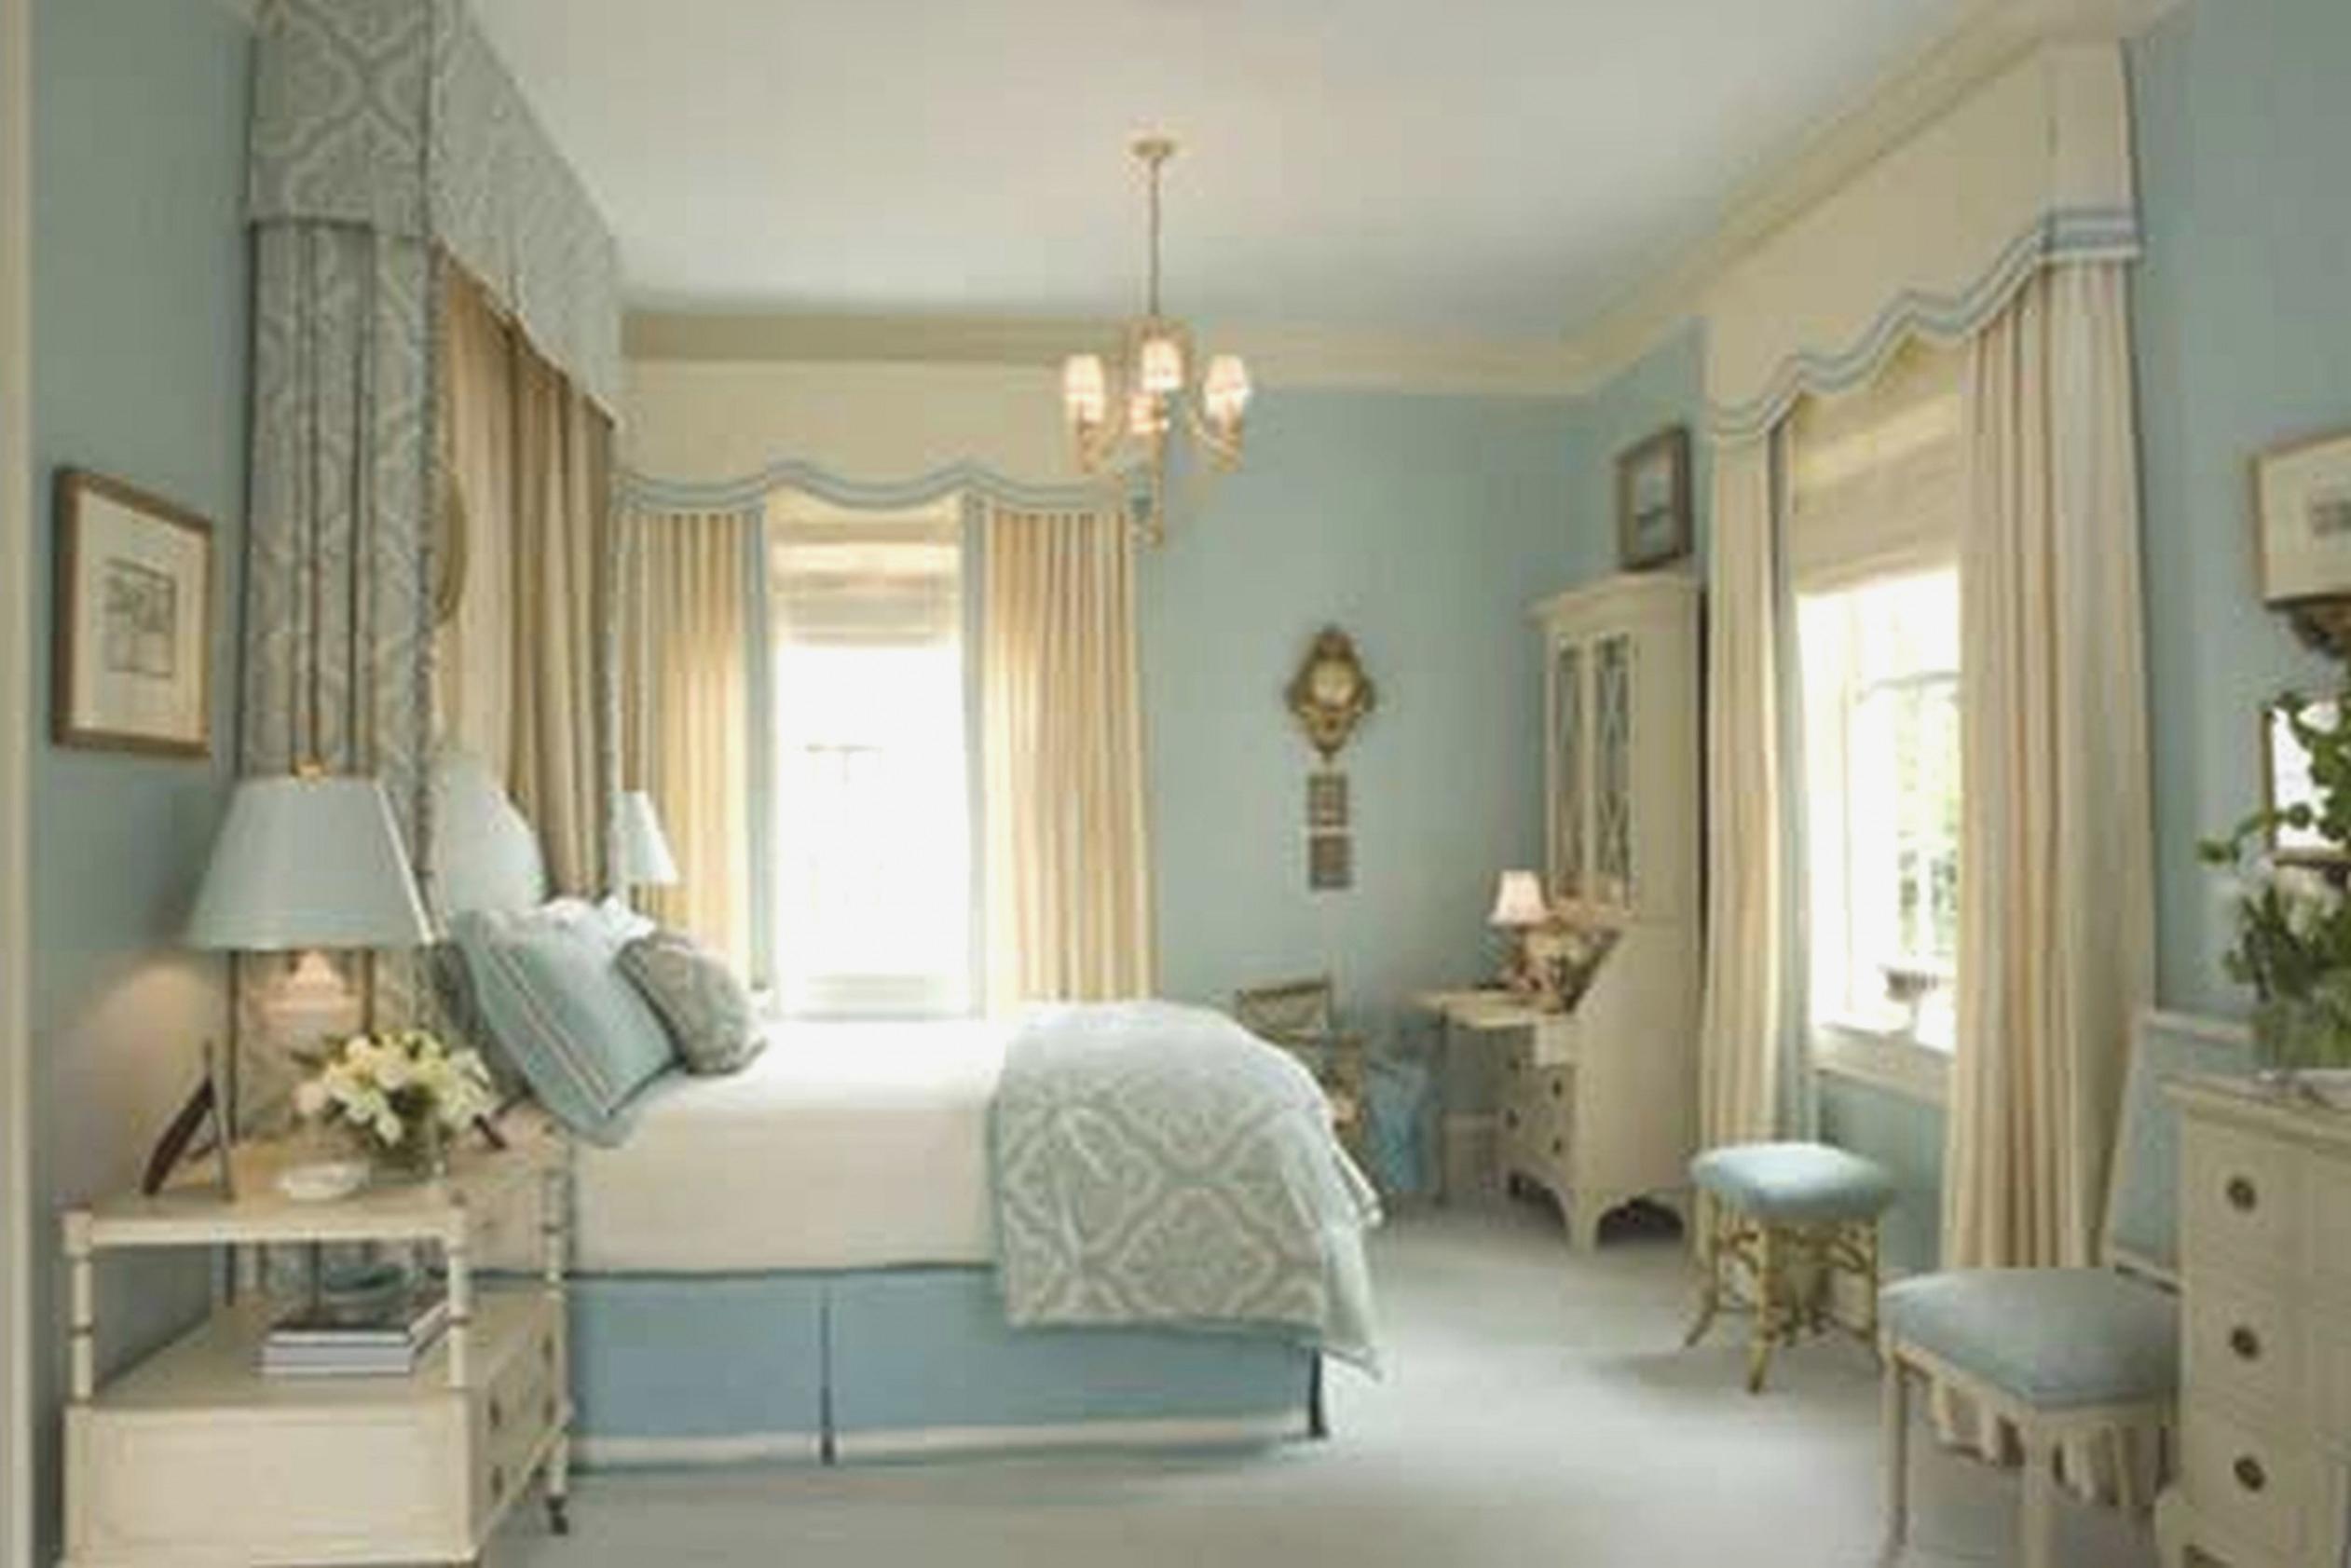 Amazing Light Blue Walls Living Room Of Grand Choice Acnn Decor